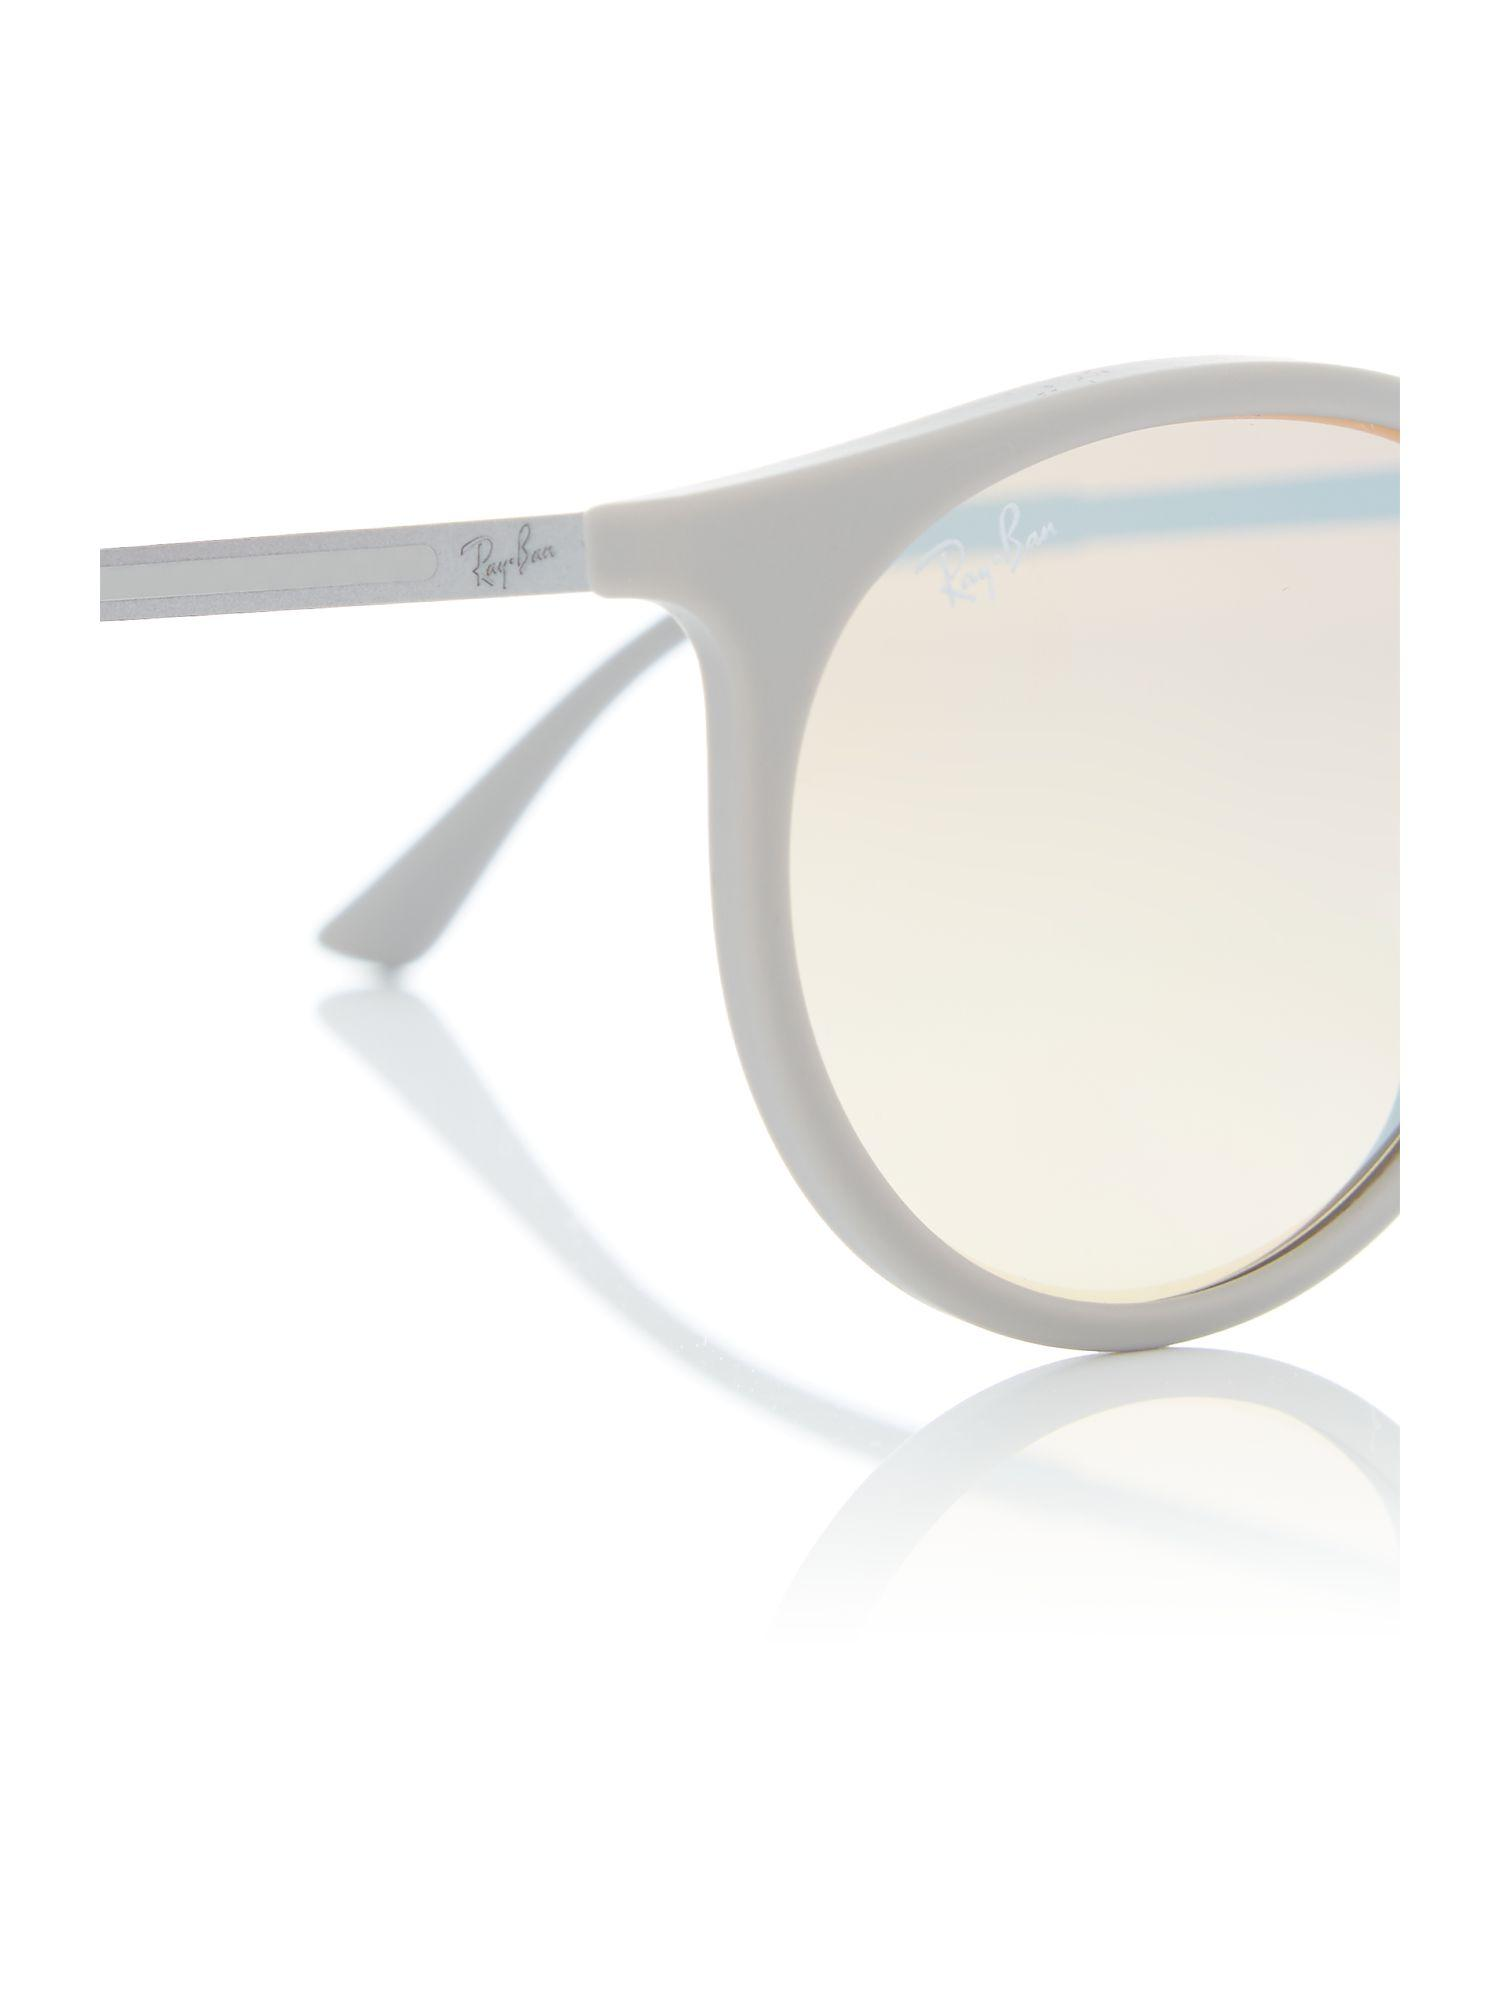 Ray-Ban Synthetic Grey Phantos Rb4274 Sunglasses